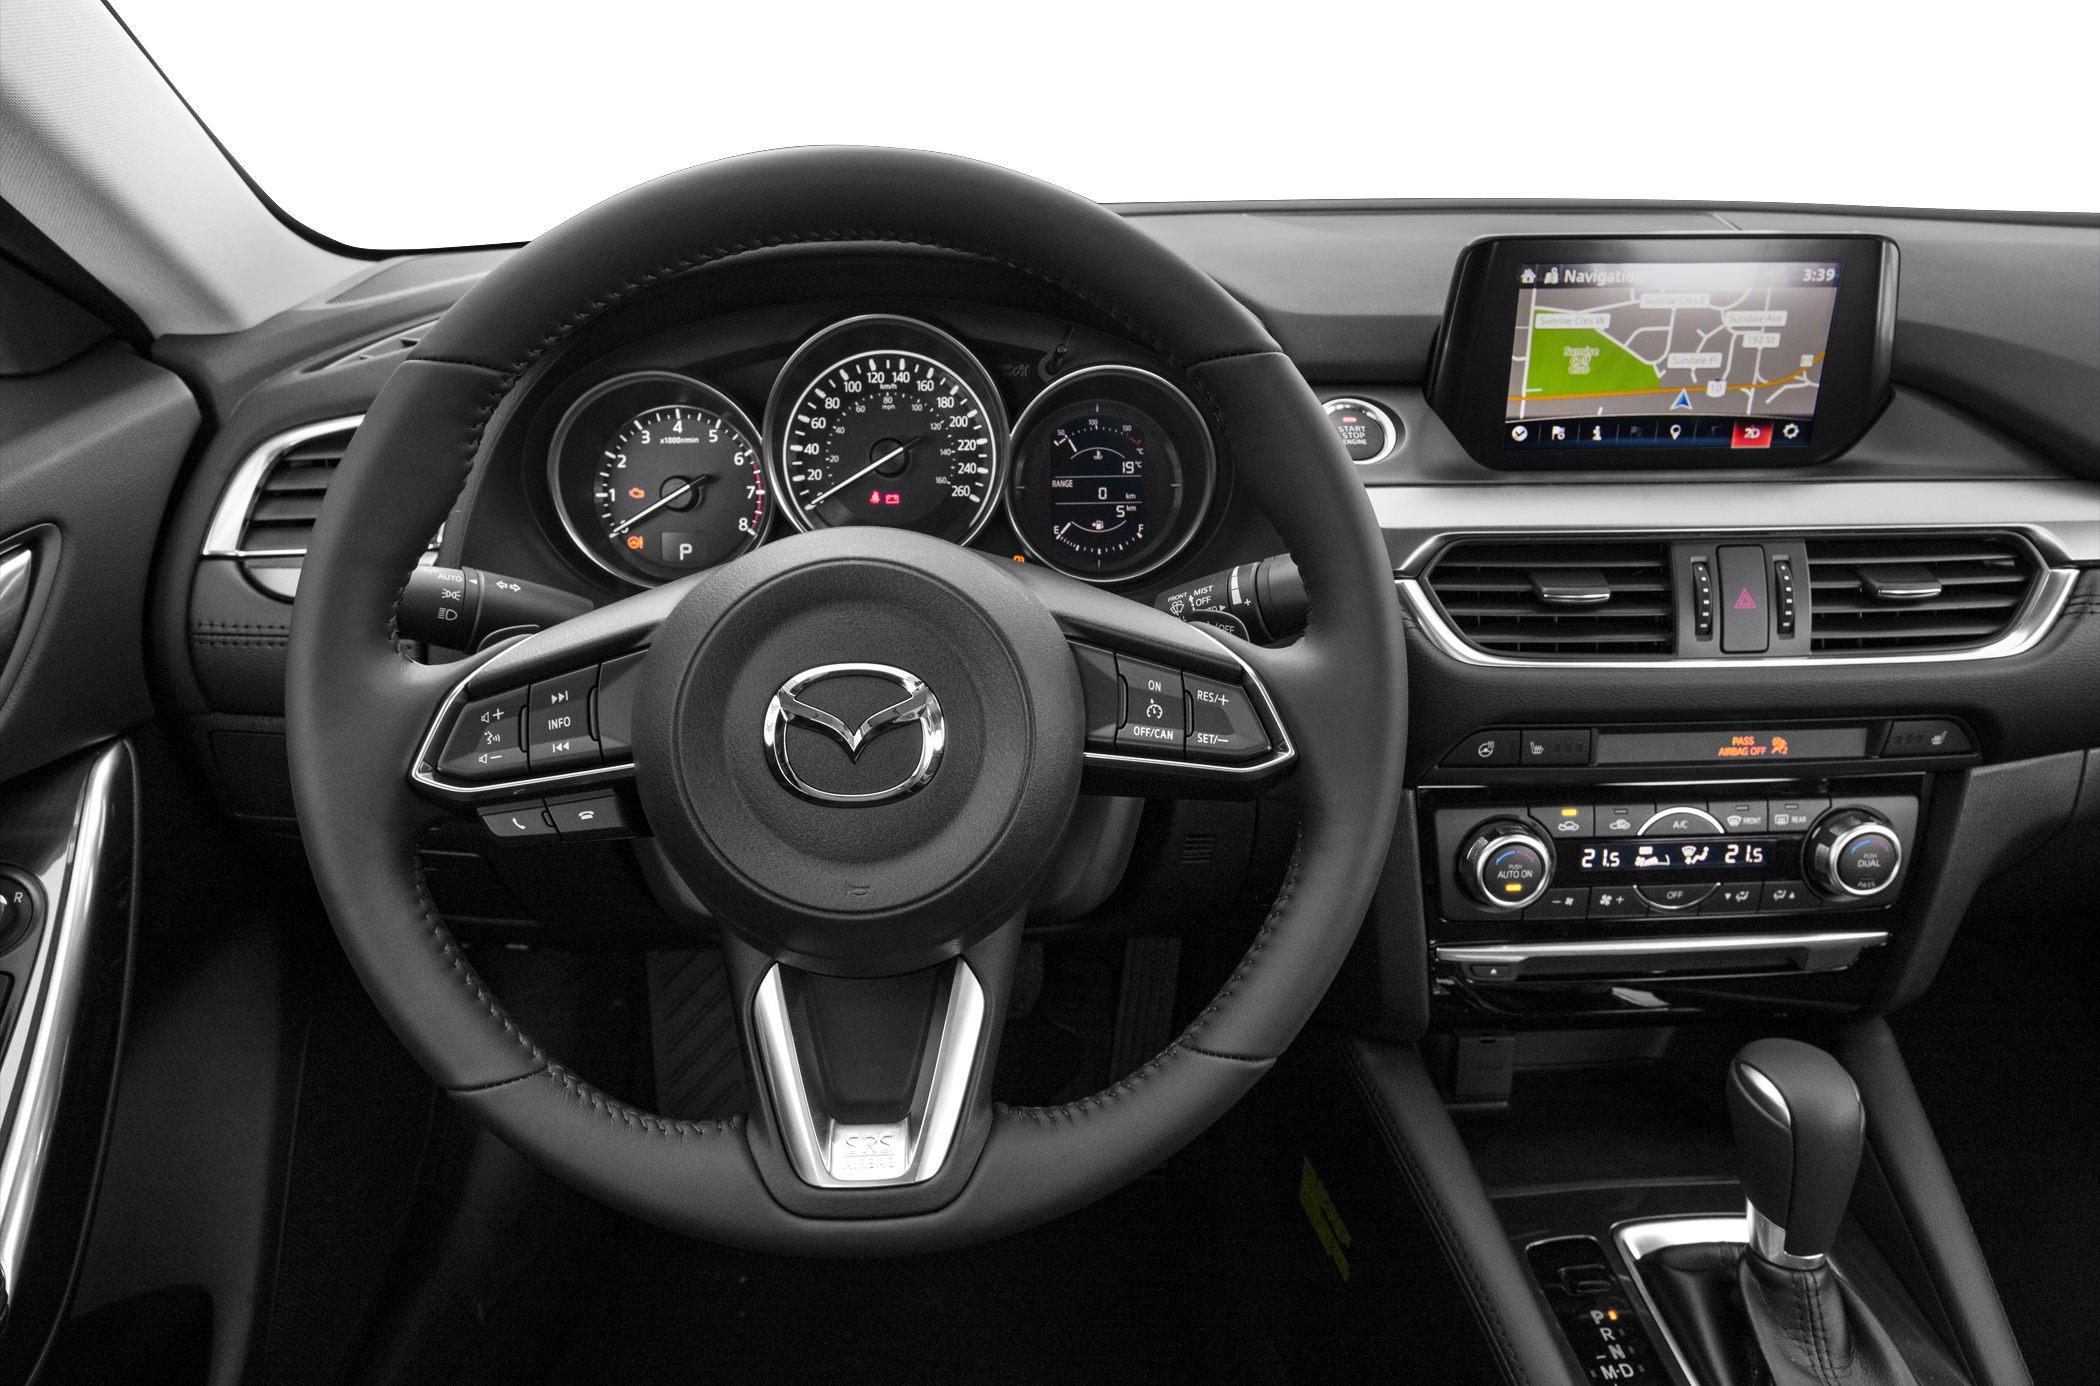 mazda 6 gj steering wheel replacement mazda 6 forums. Black Bedroom Furniture Sets. Home Design Ideas